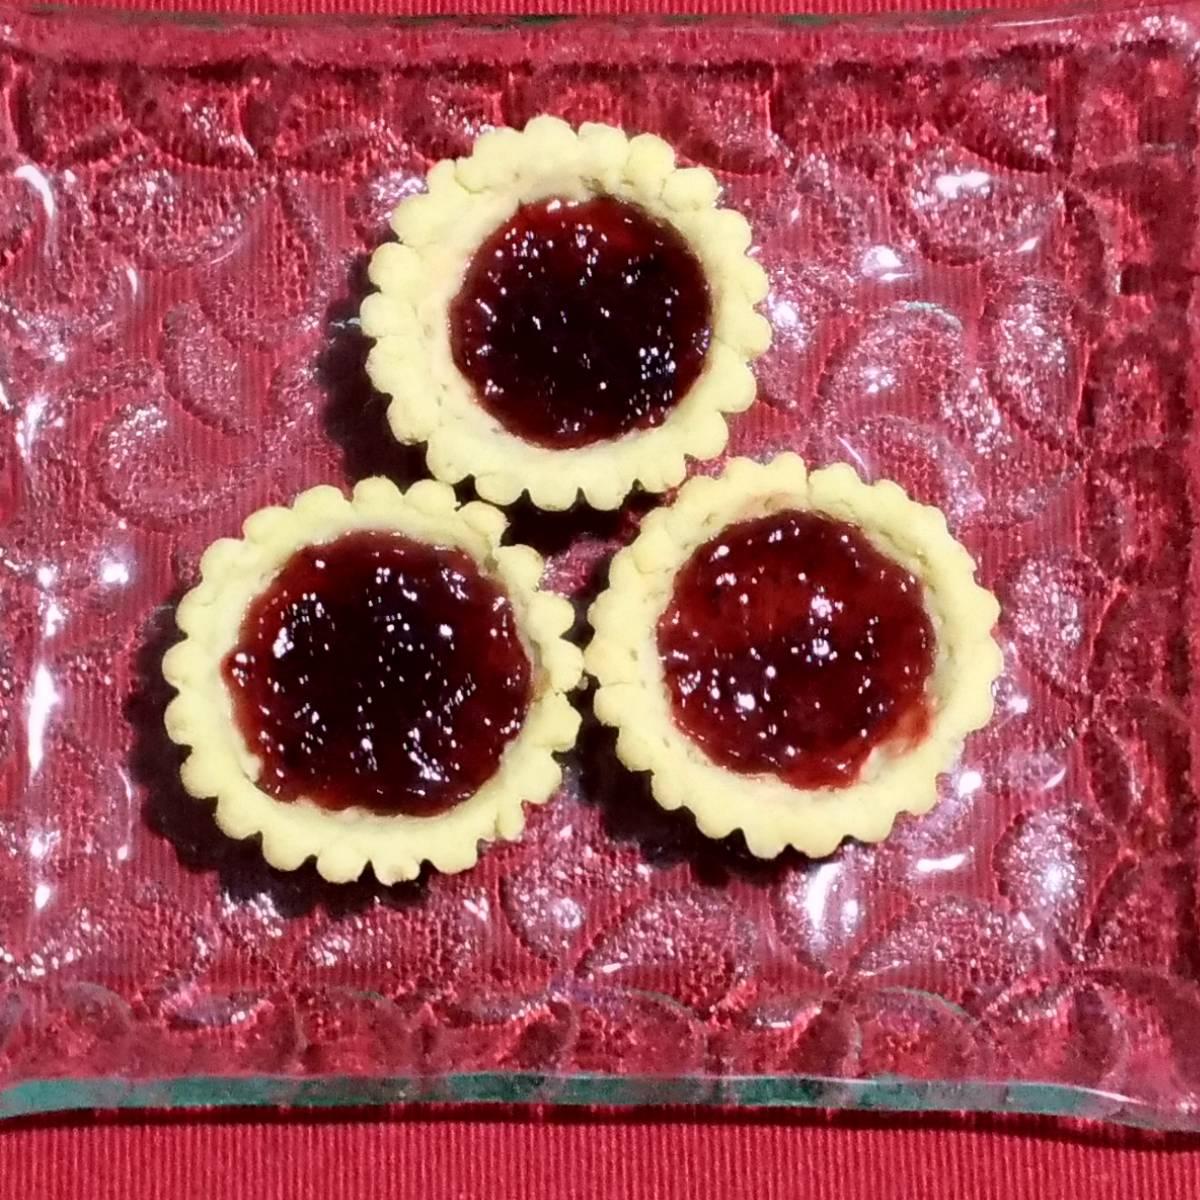 Mini Pie Strawberry Original Crust (paket 3 Pieces)1